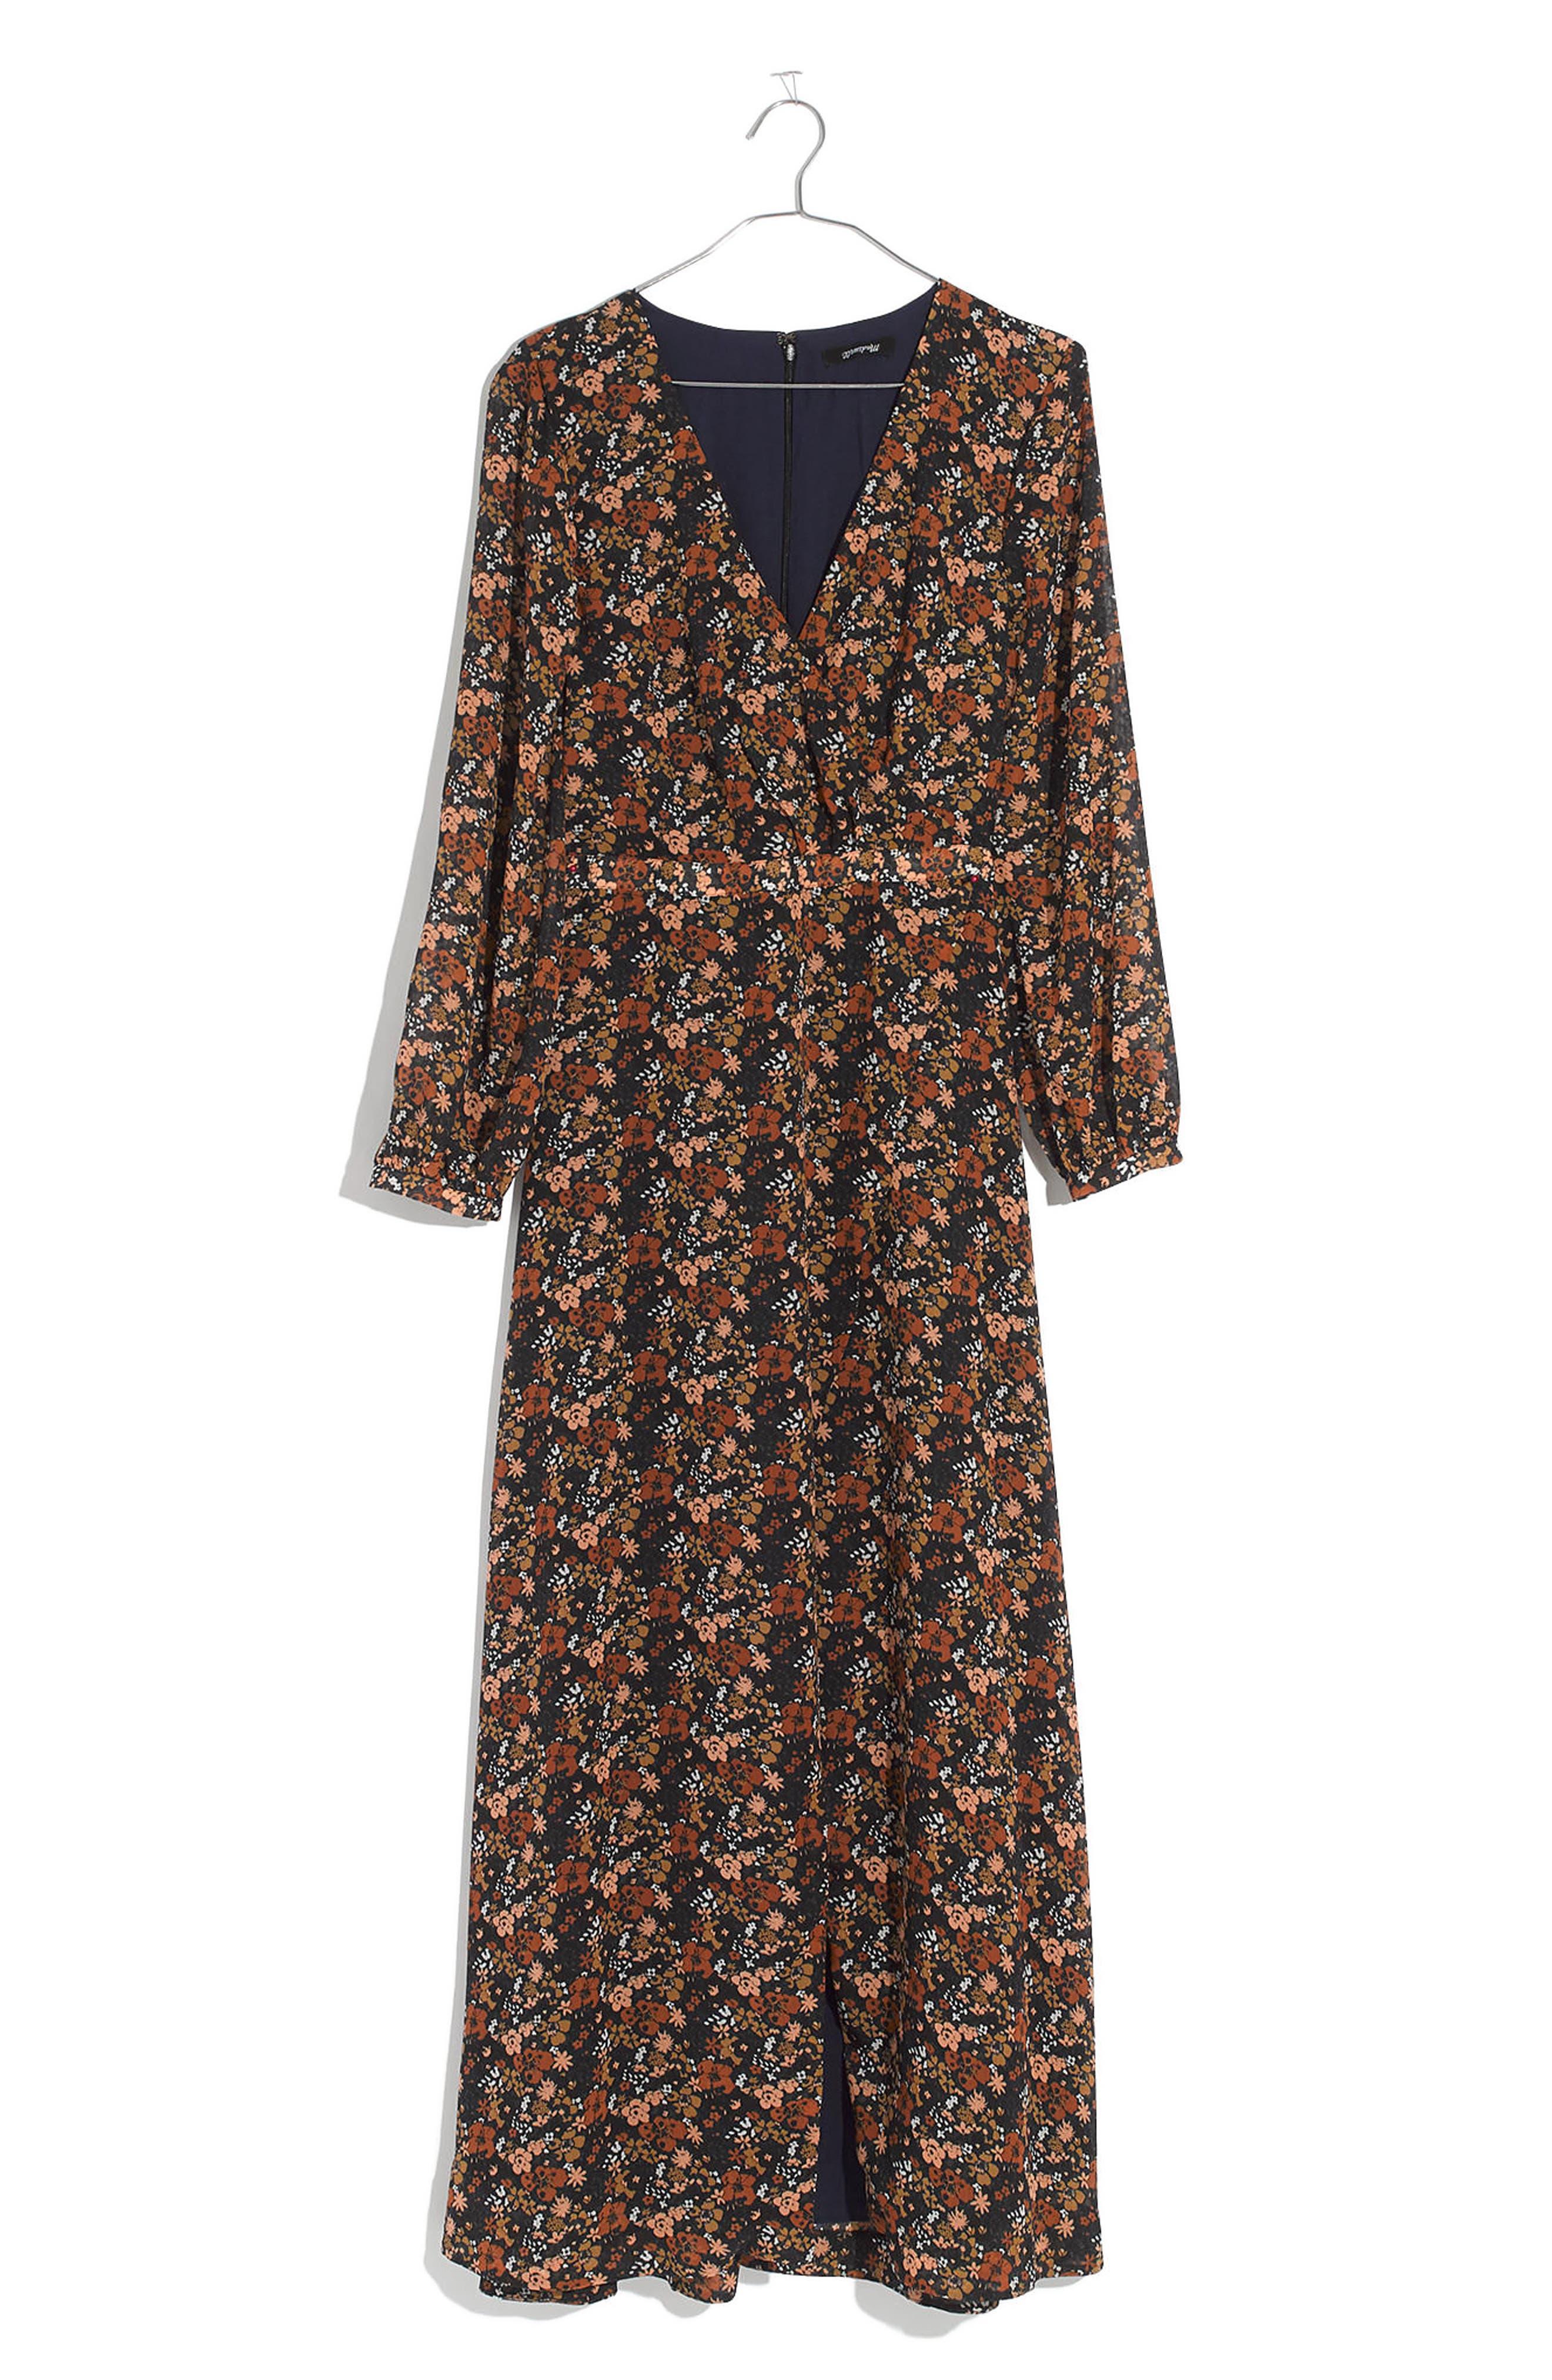 Nightflower Maxi Dress,                             Alternate thumbnail 3, color,                             200